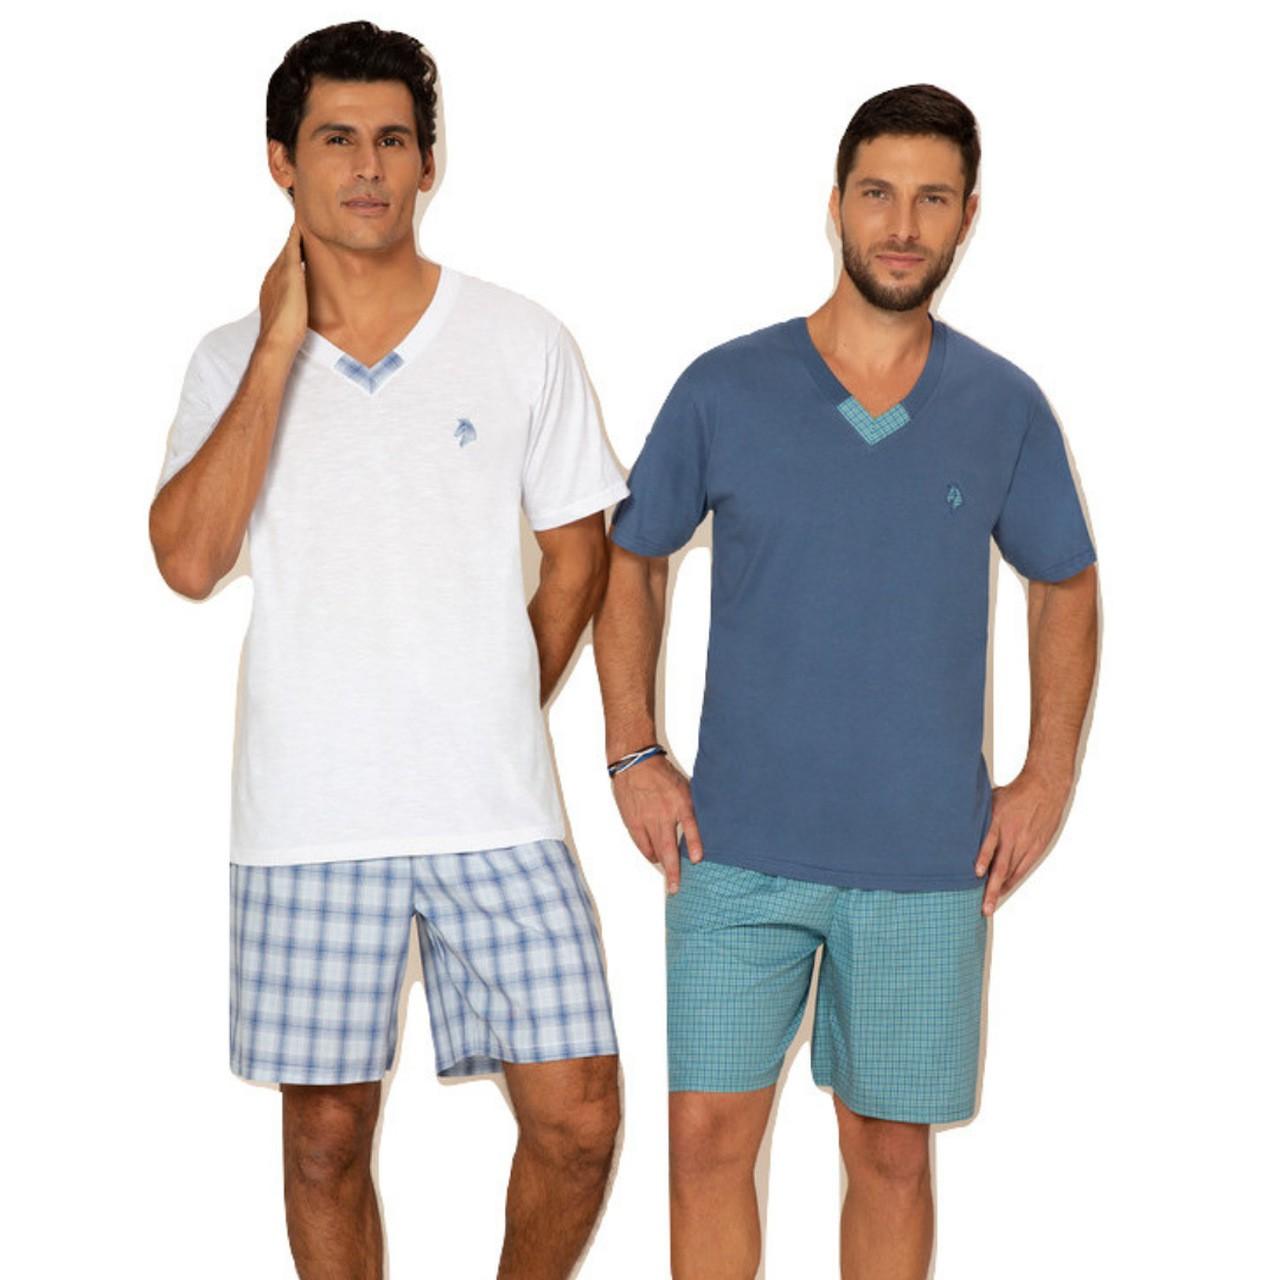 Pijama verão masculino manga curta gola v  bermuda xadrez